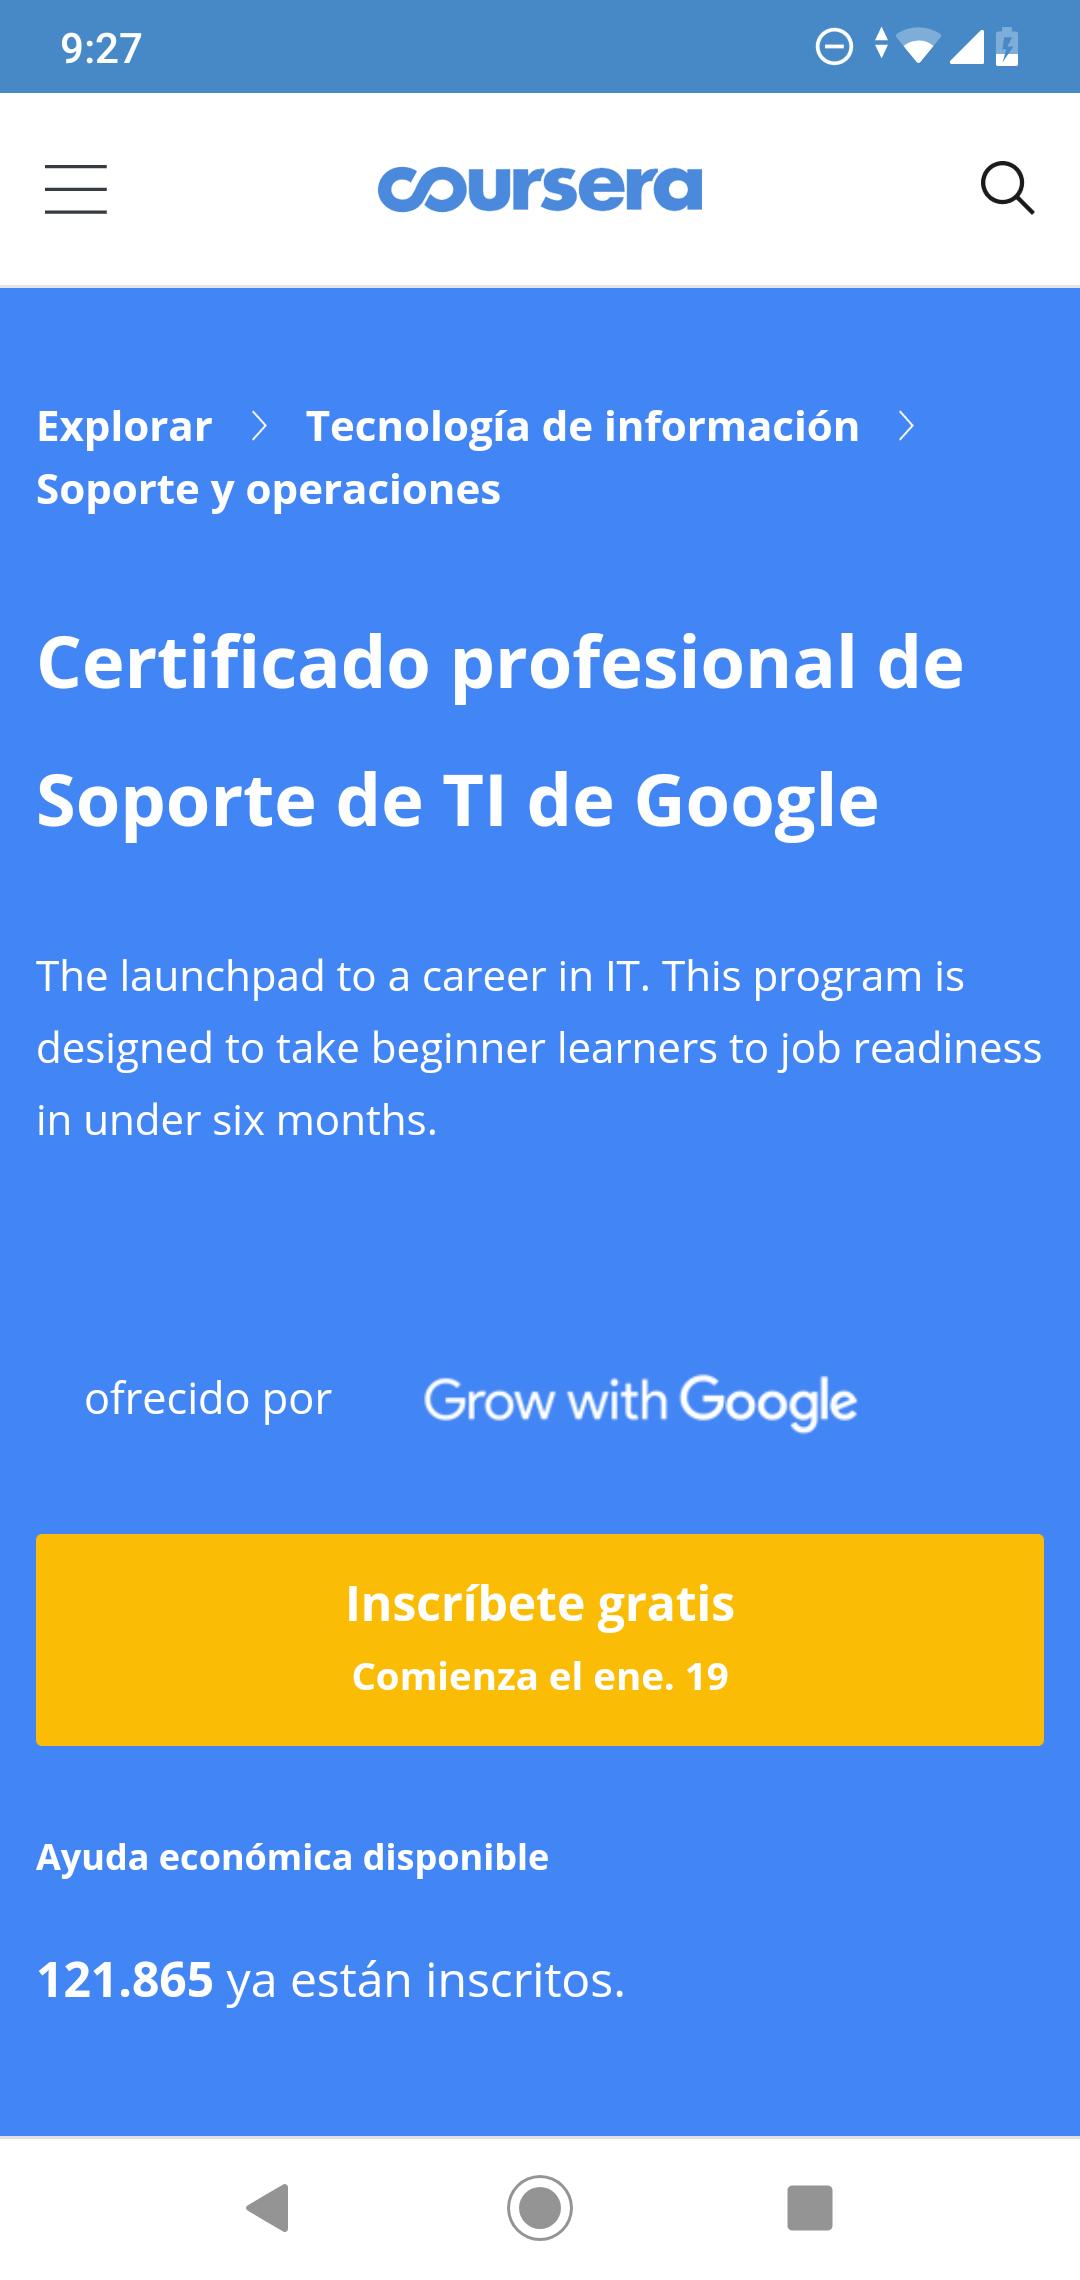 Curso gratis Google IT con certificación profesional